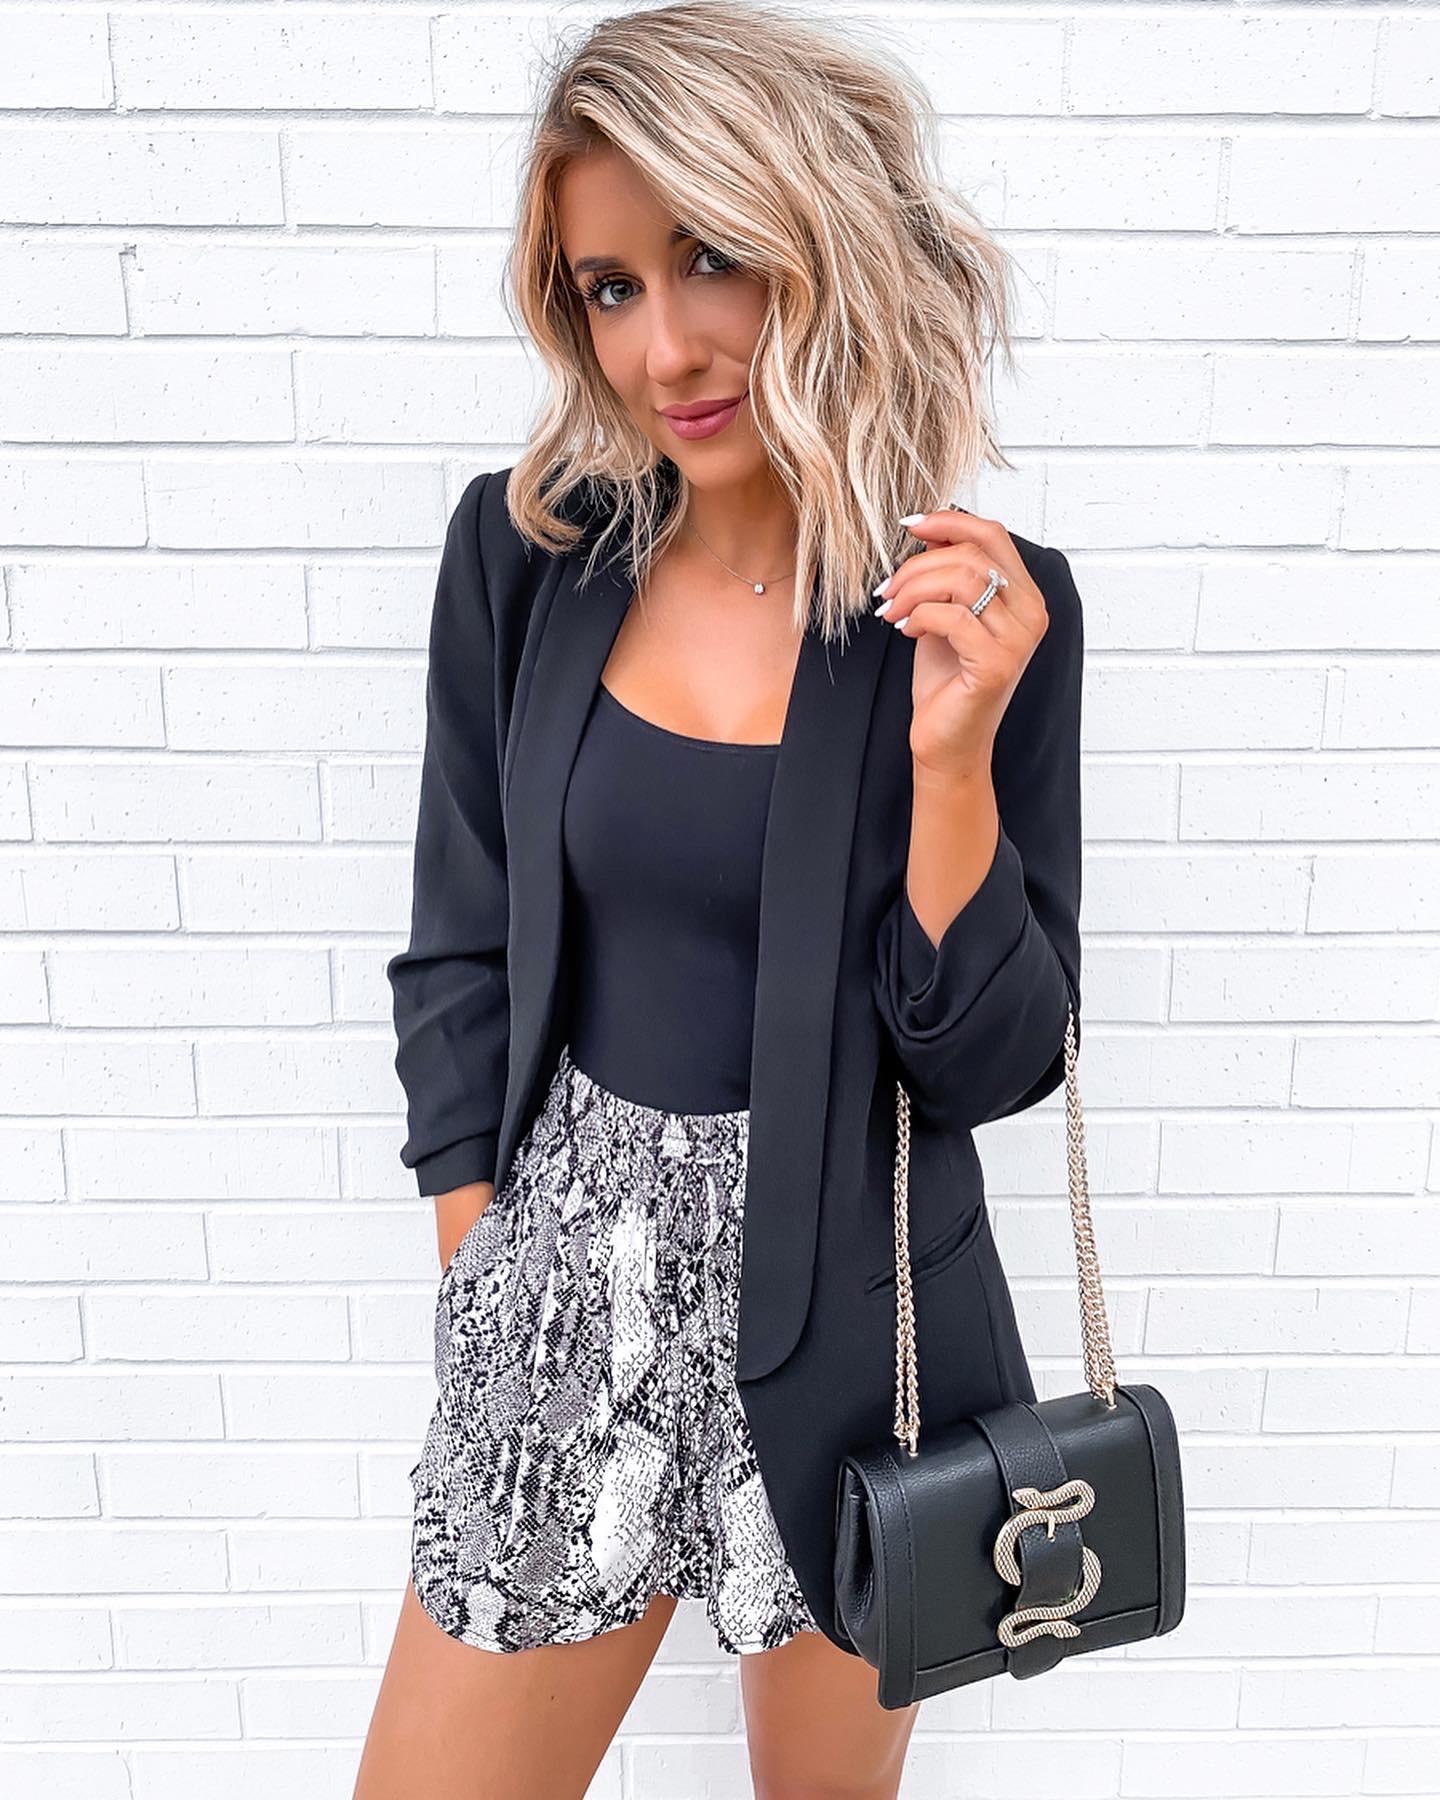 Laura Beverlin Day to night outfit snakeskin shorts black cami black blazer snake crossbody bag2